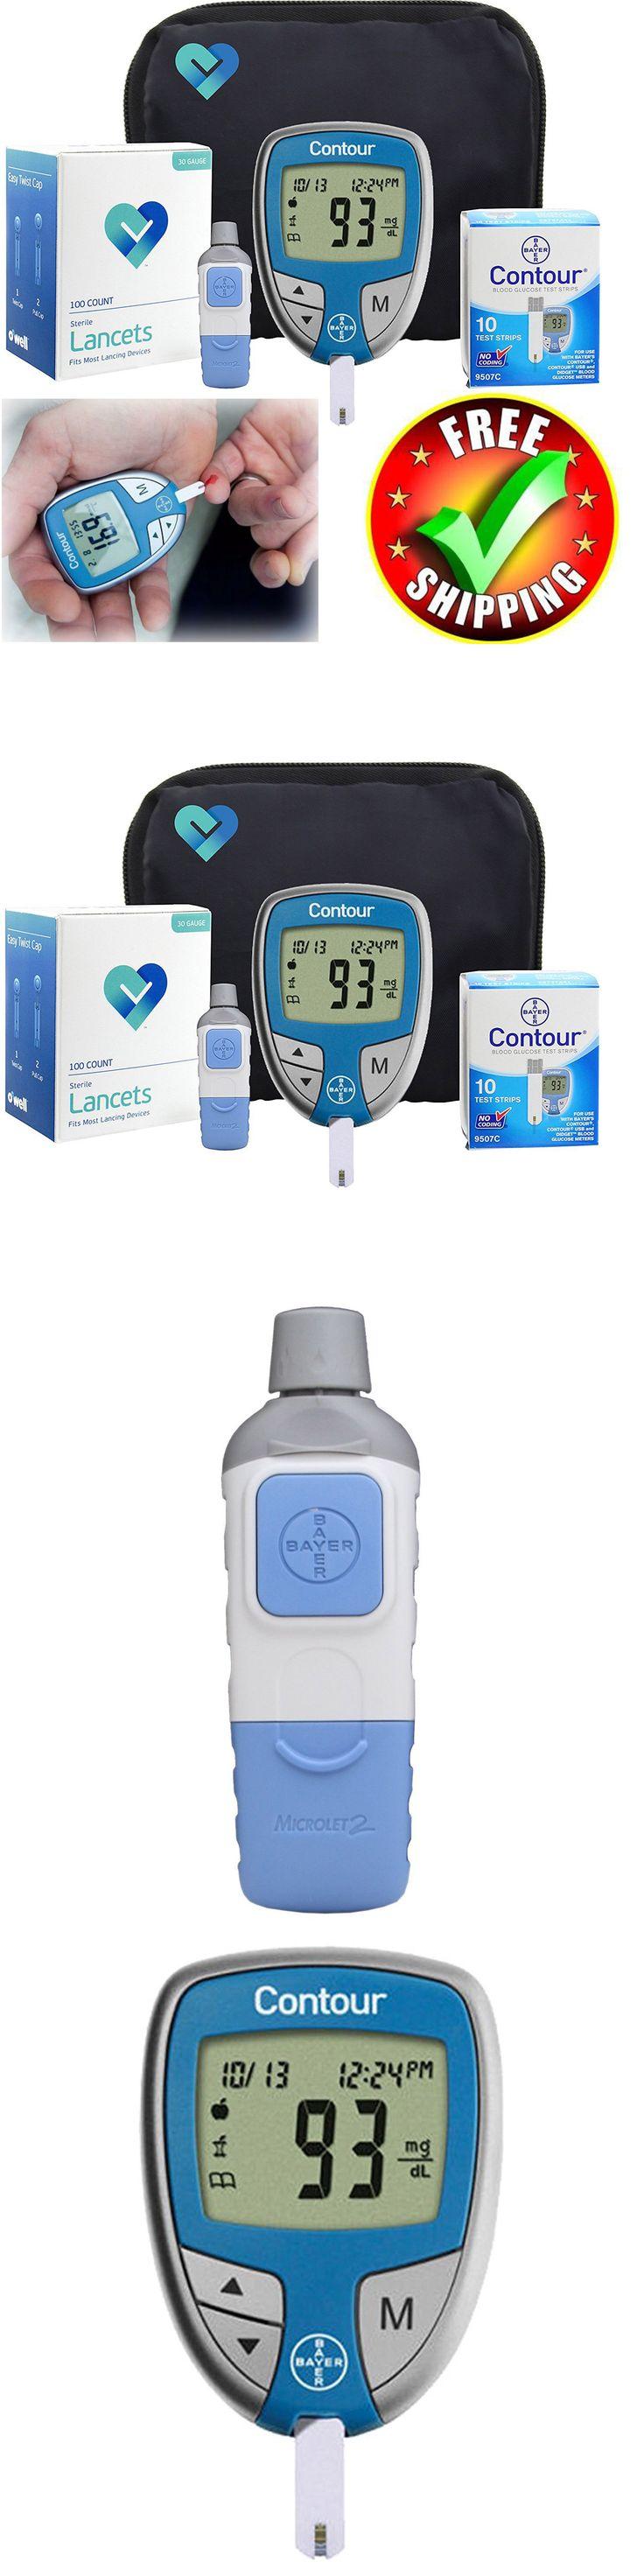 Glucose Monitors: Diabetes Test Kit Diabetic Tester Strip Lancet Blood Glucose Meter Sugar Machine -> BUY IT NOW ONLY: $47.99 on eBay!